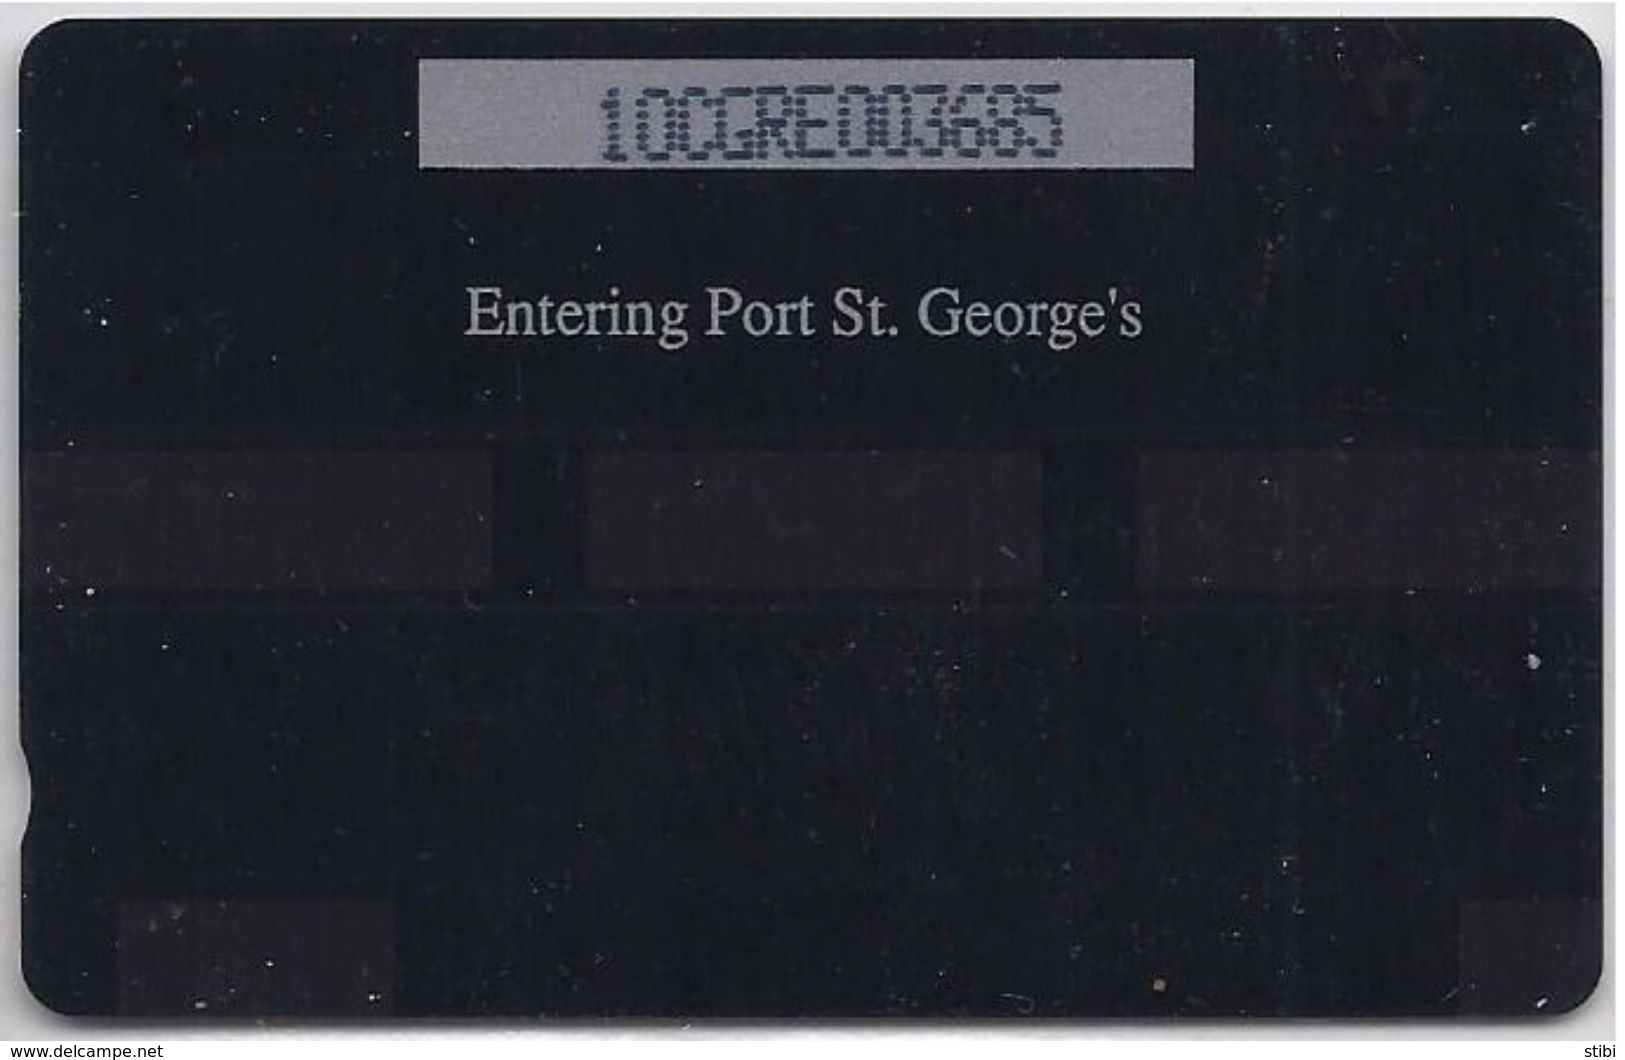 GRENADA - ENTERING PORT ST GEORGE'S - 10CGRE - Grenada